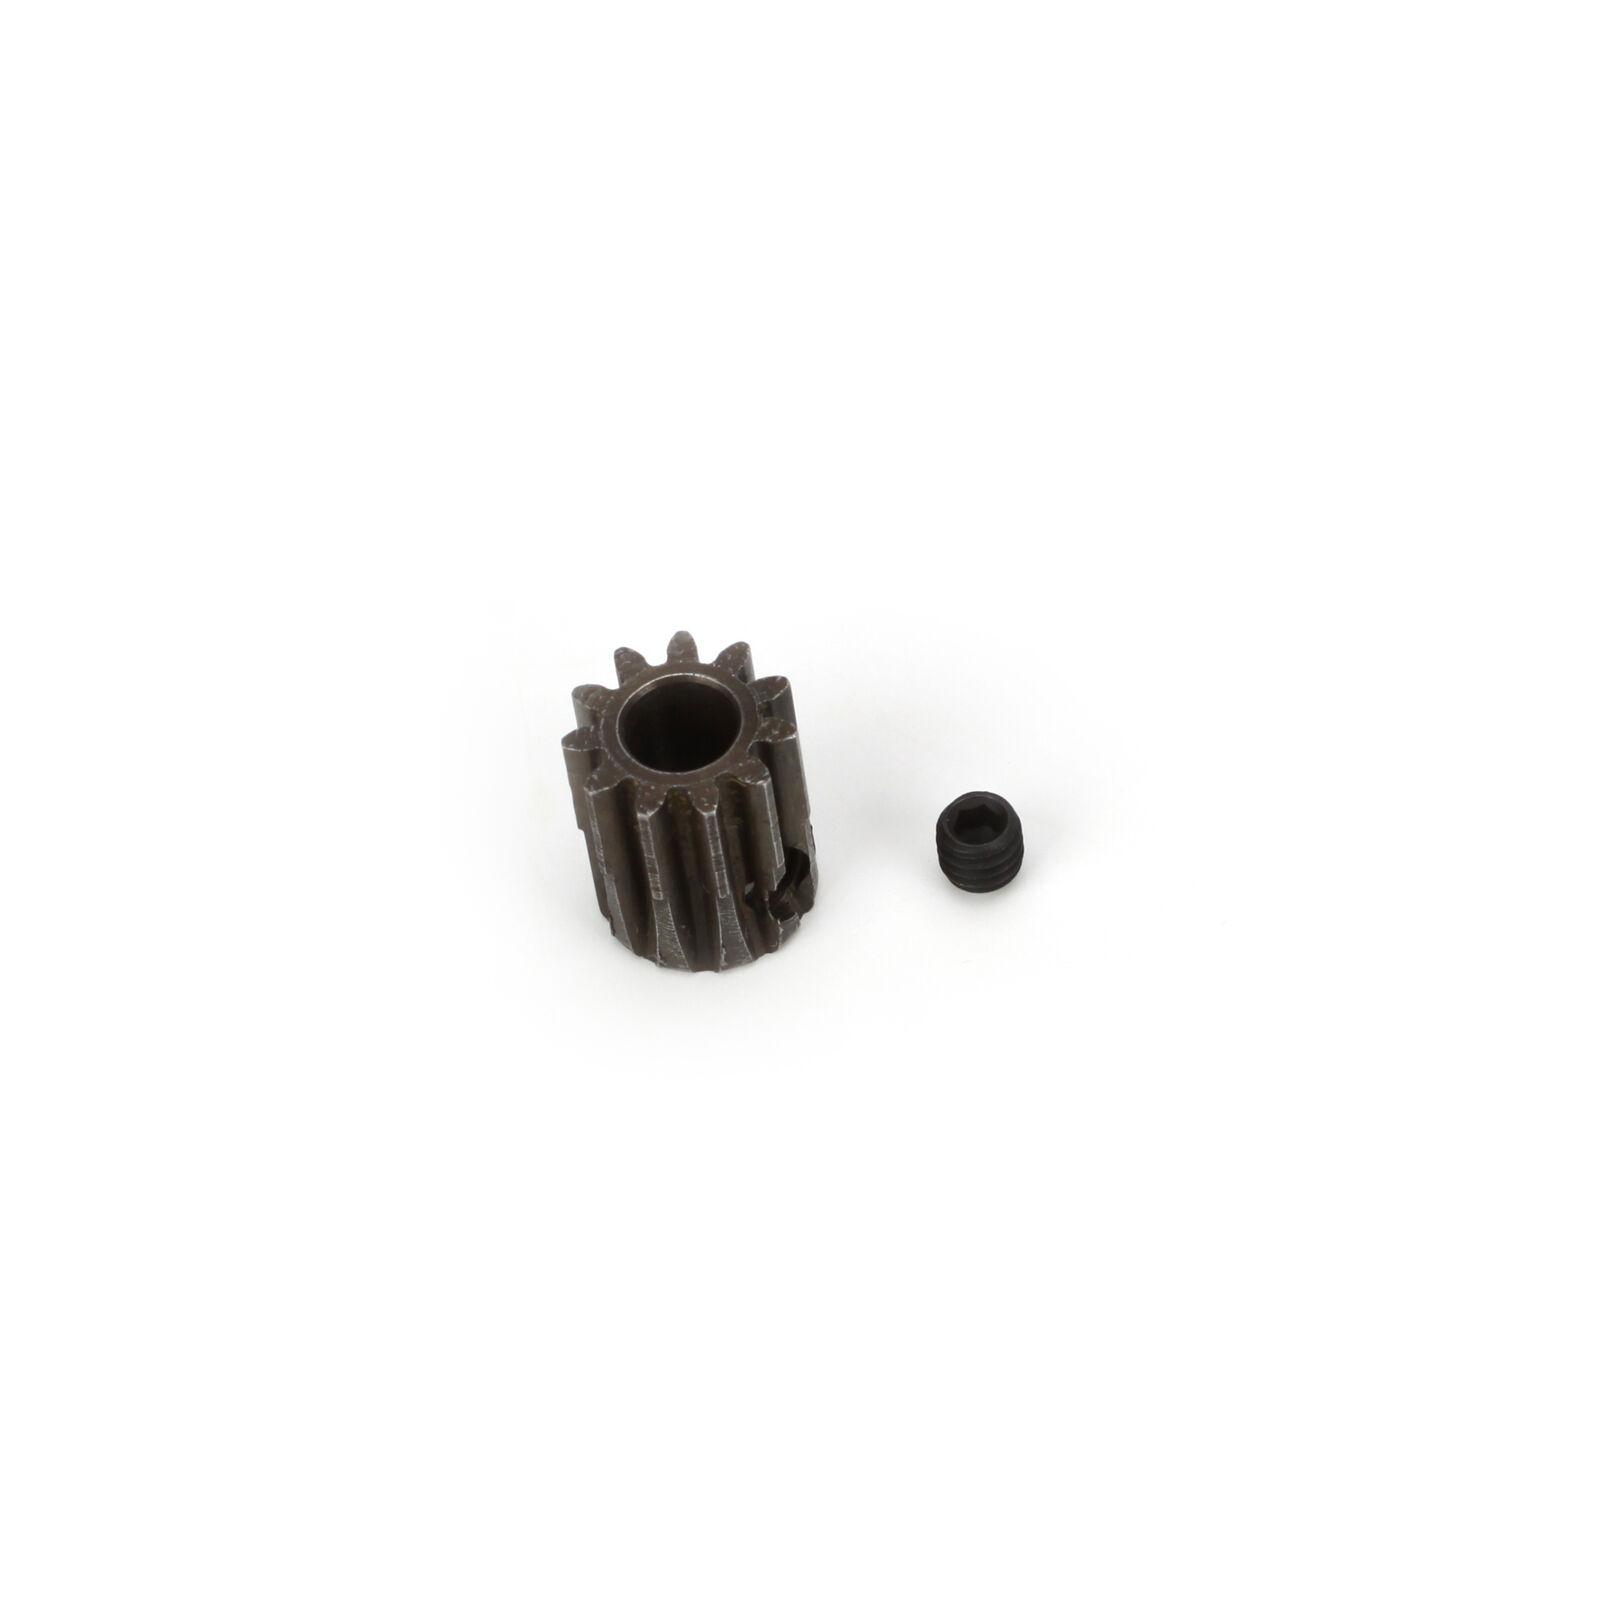 Extra Hard 5mm Bore .8 Module (31.75P) Pinion, 11T